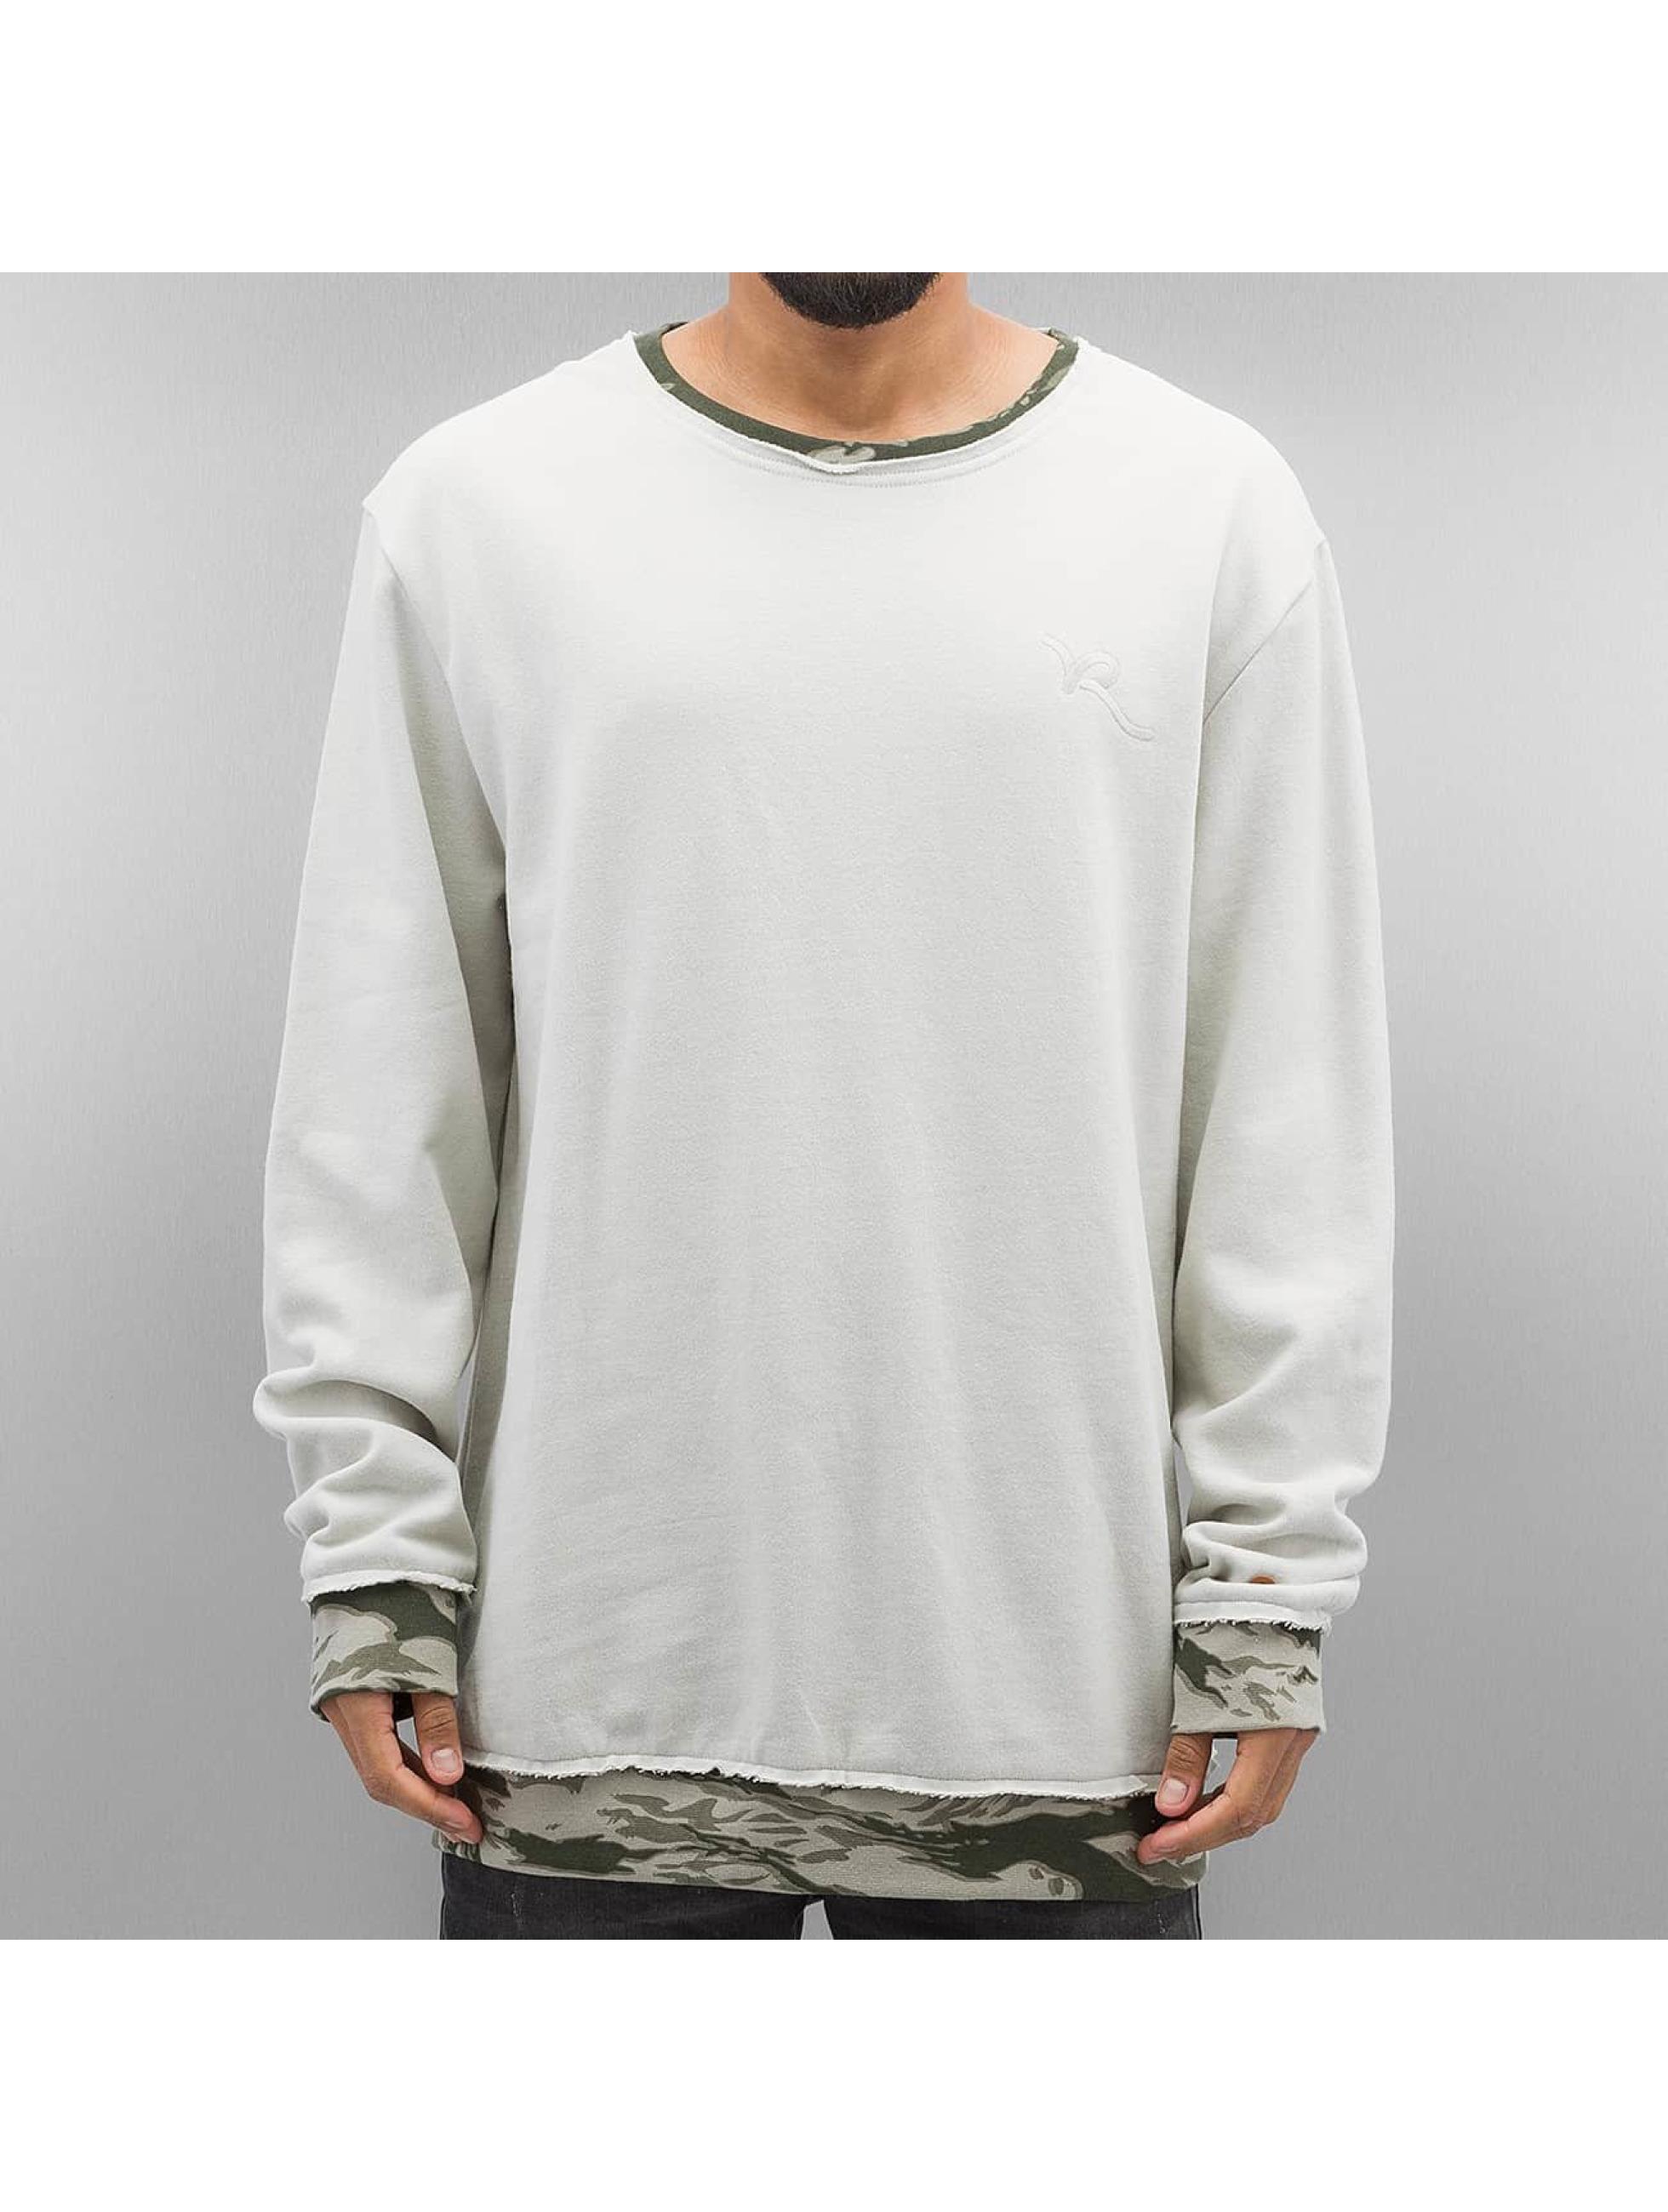 Rocawear Pullover Sweatshirt olive